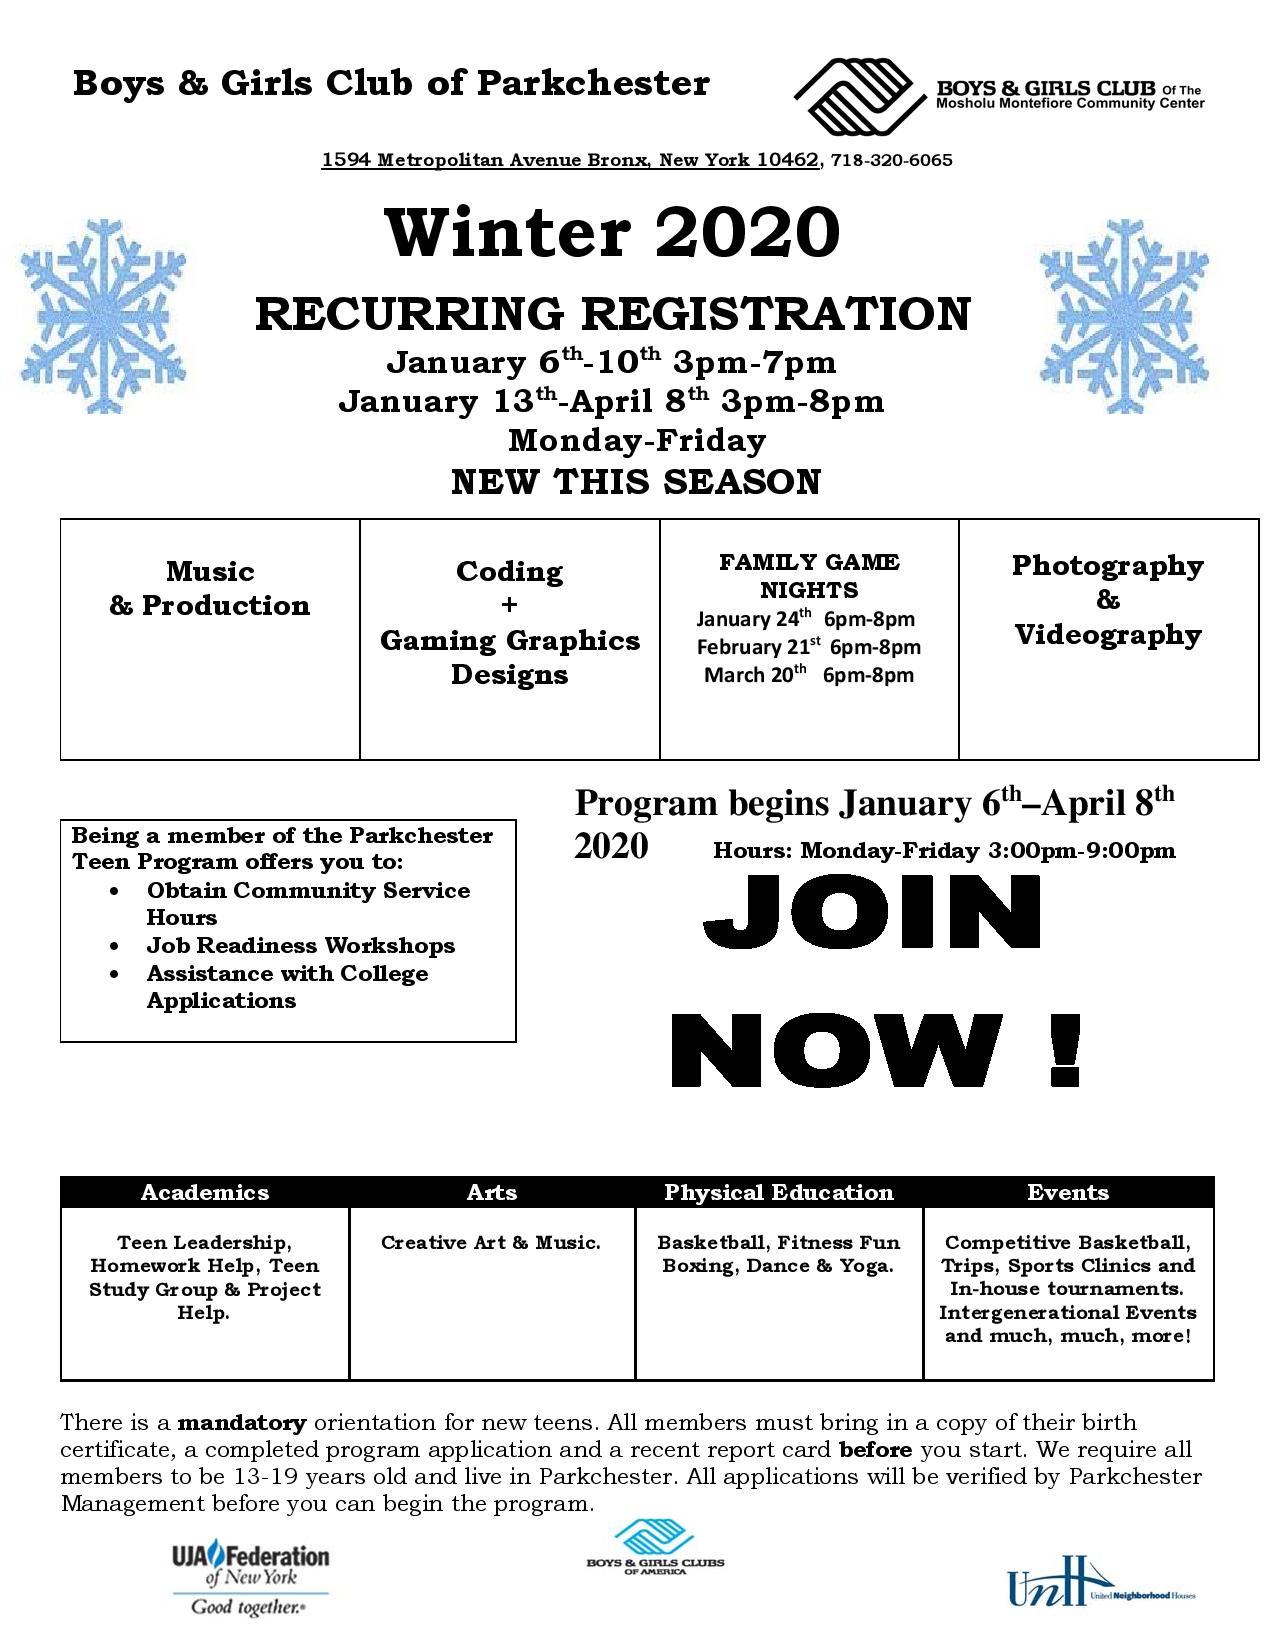 Boys and Girls Club Winter Registration